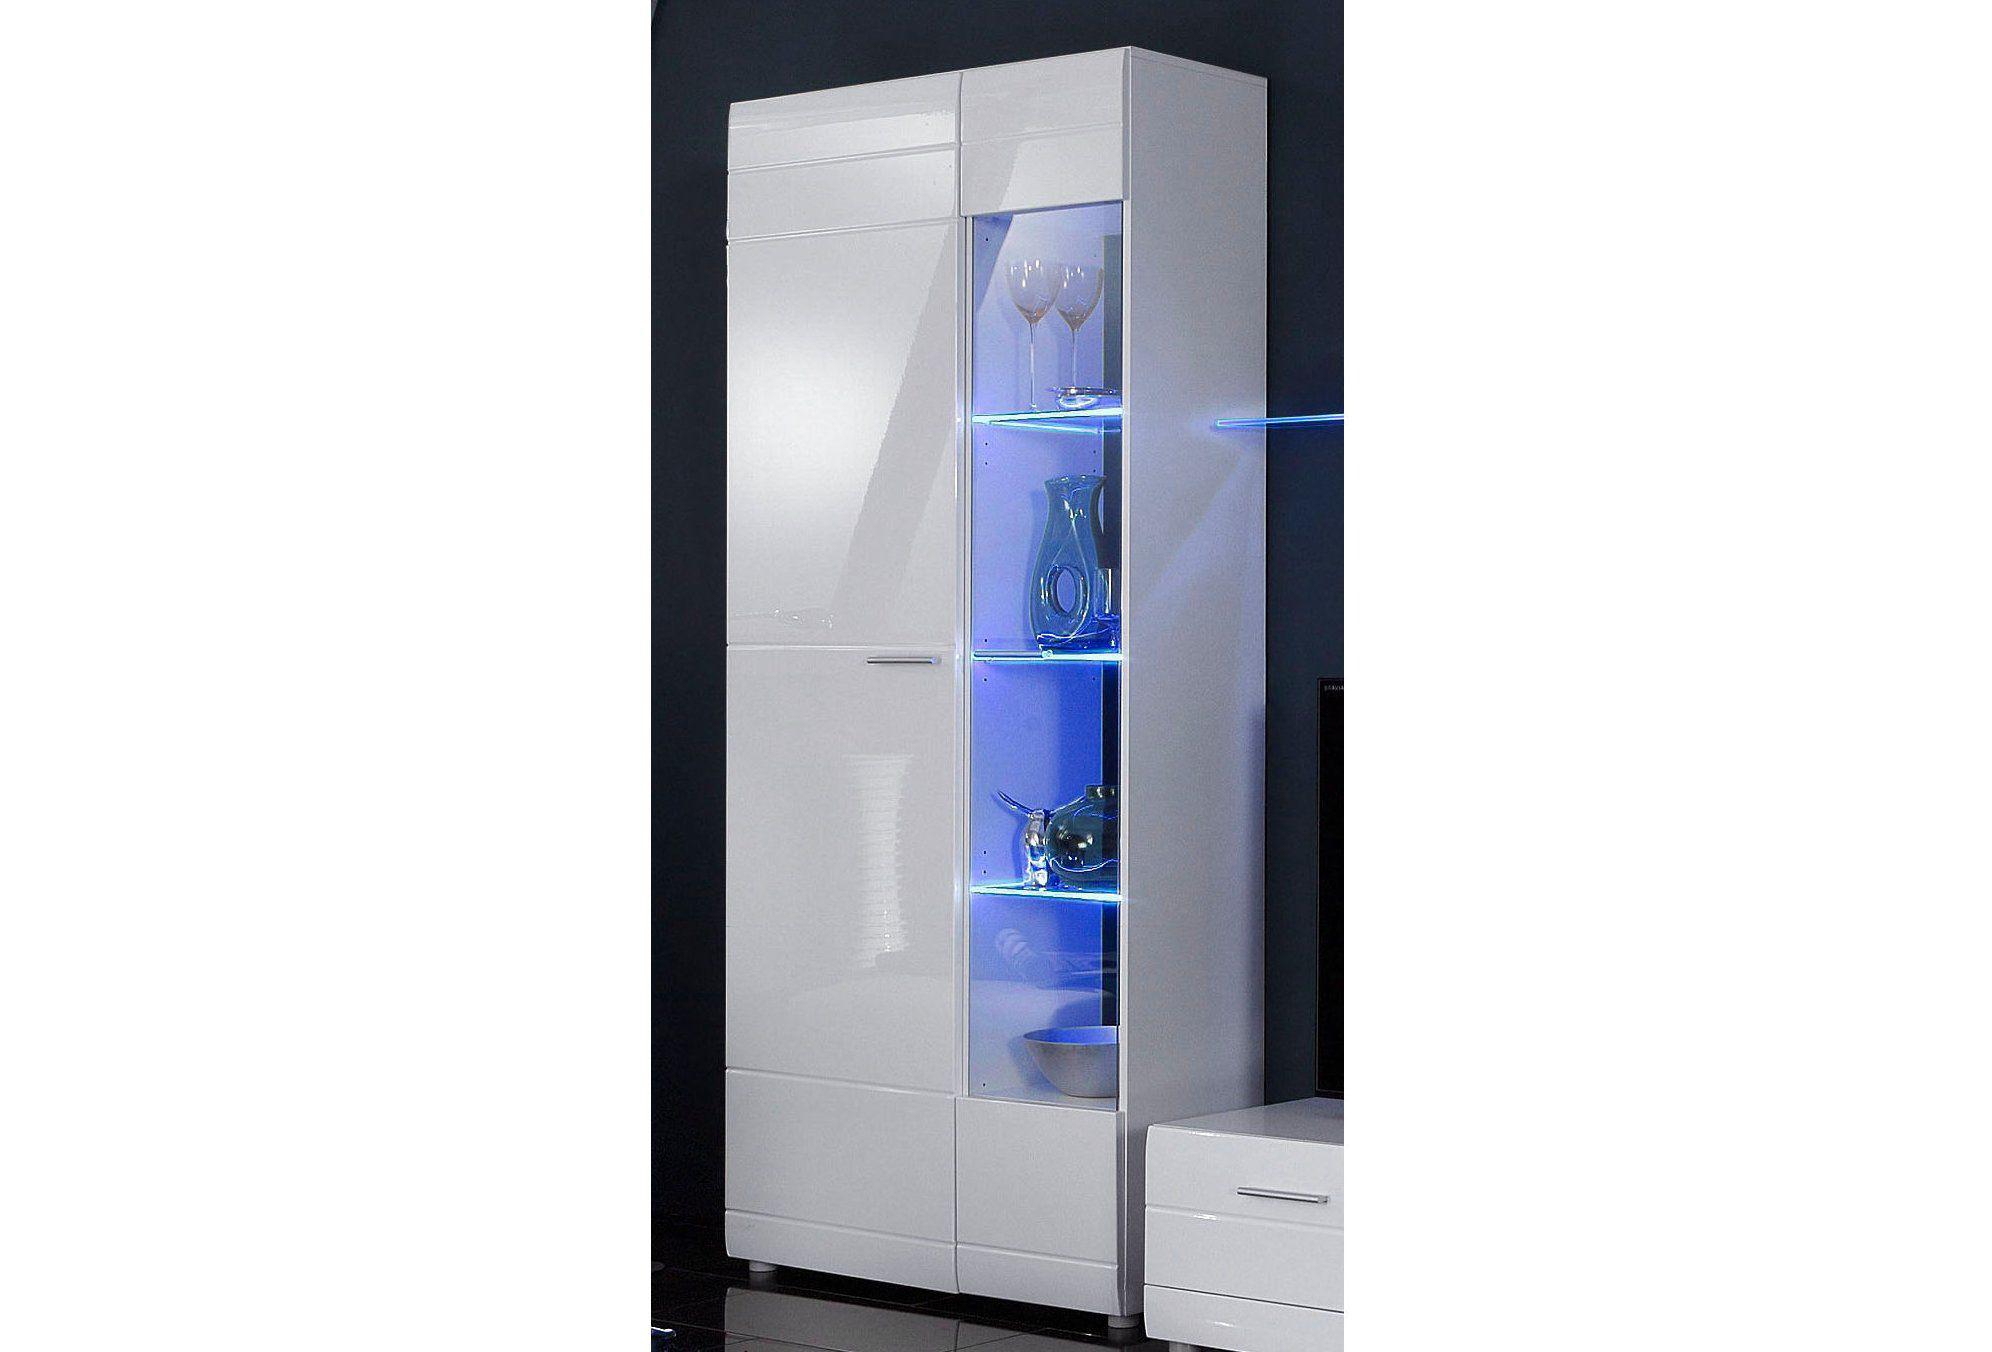 standvitrine h he 200 cm schwab versand wohnw nde. Black Bedroom Furniture Sets. Home Design Ideas